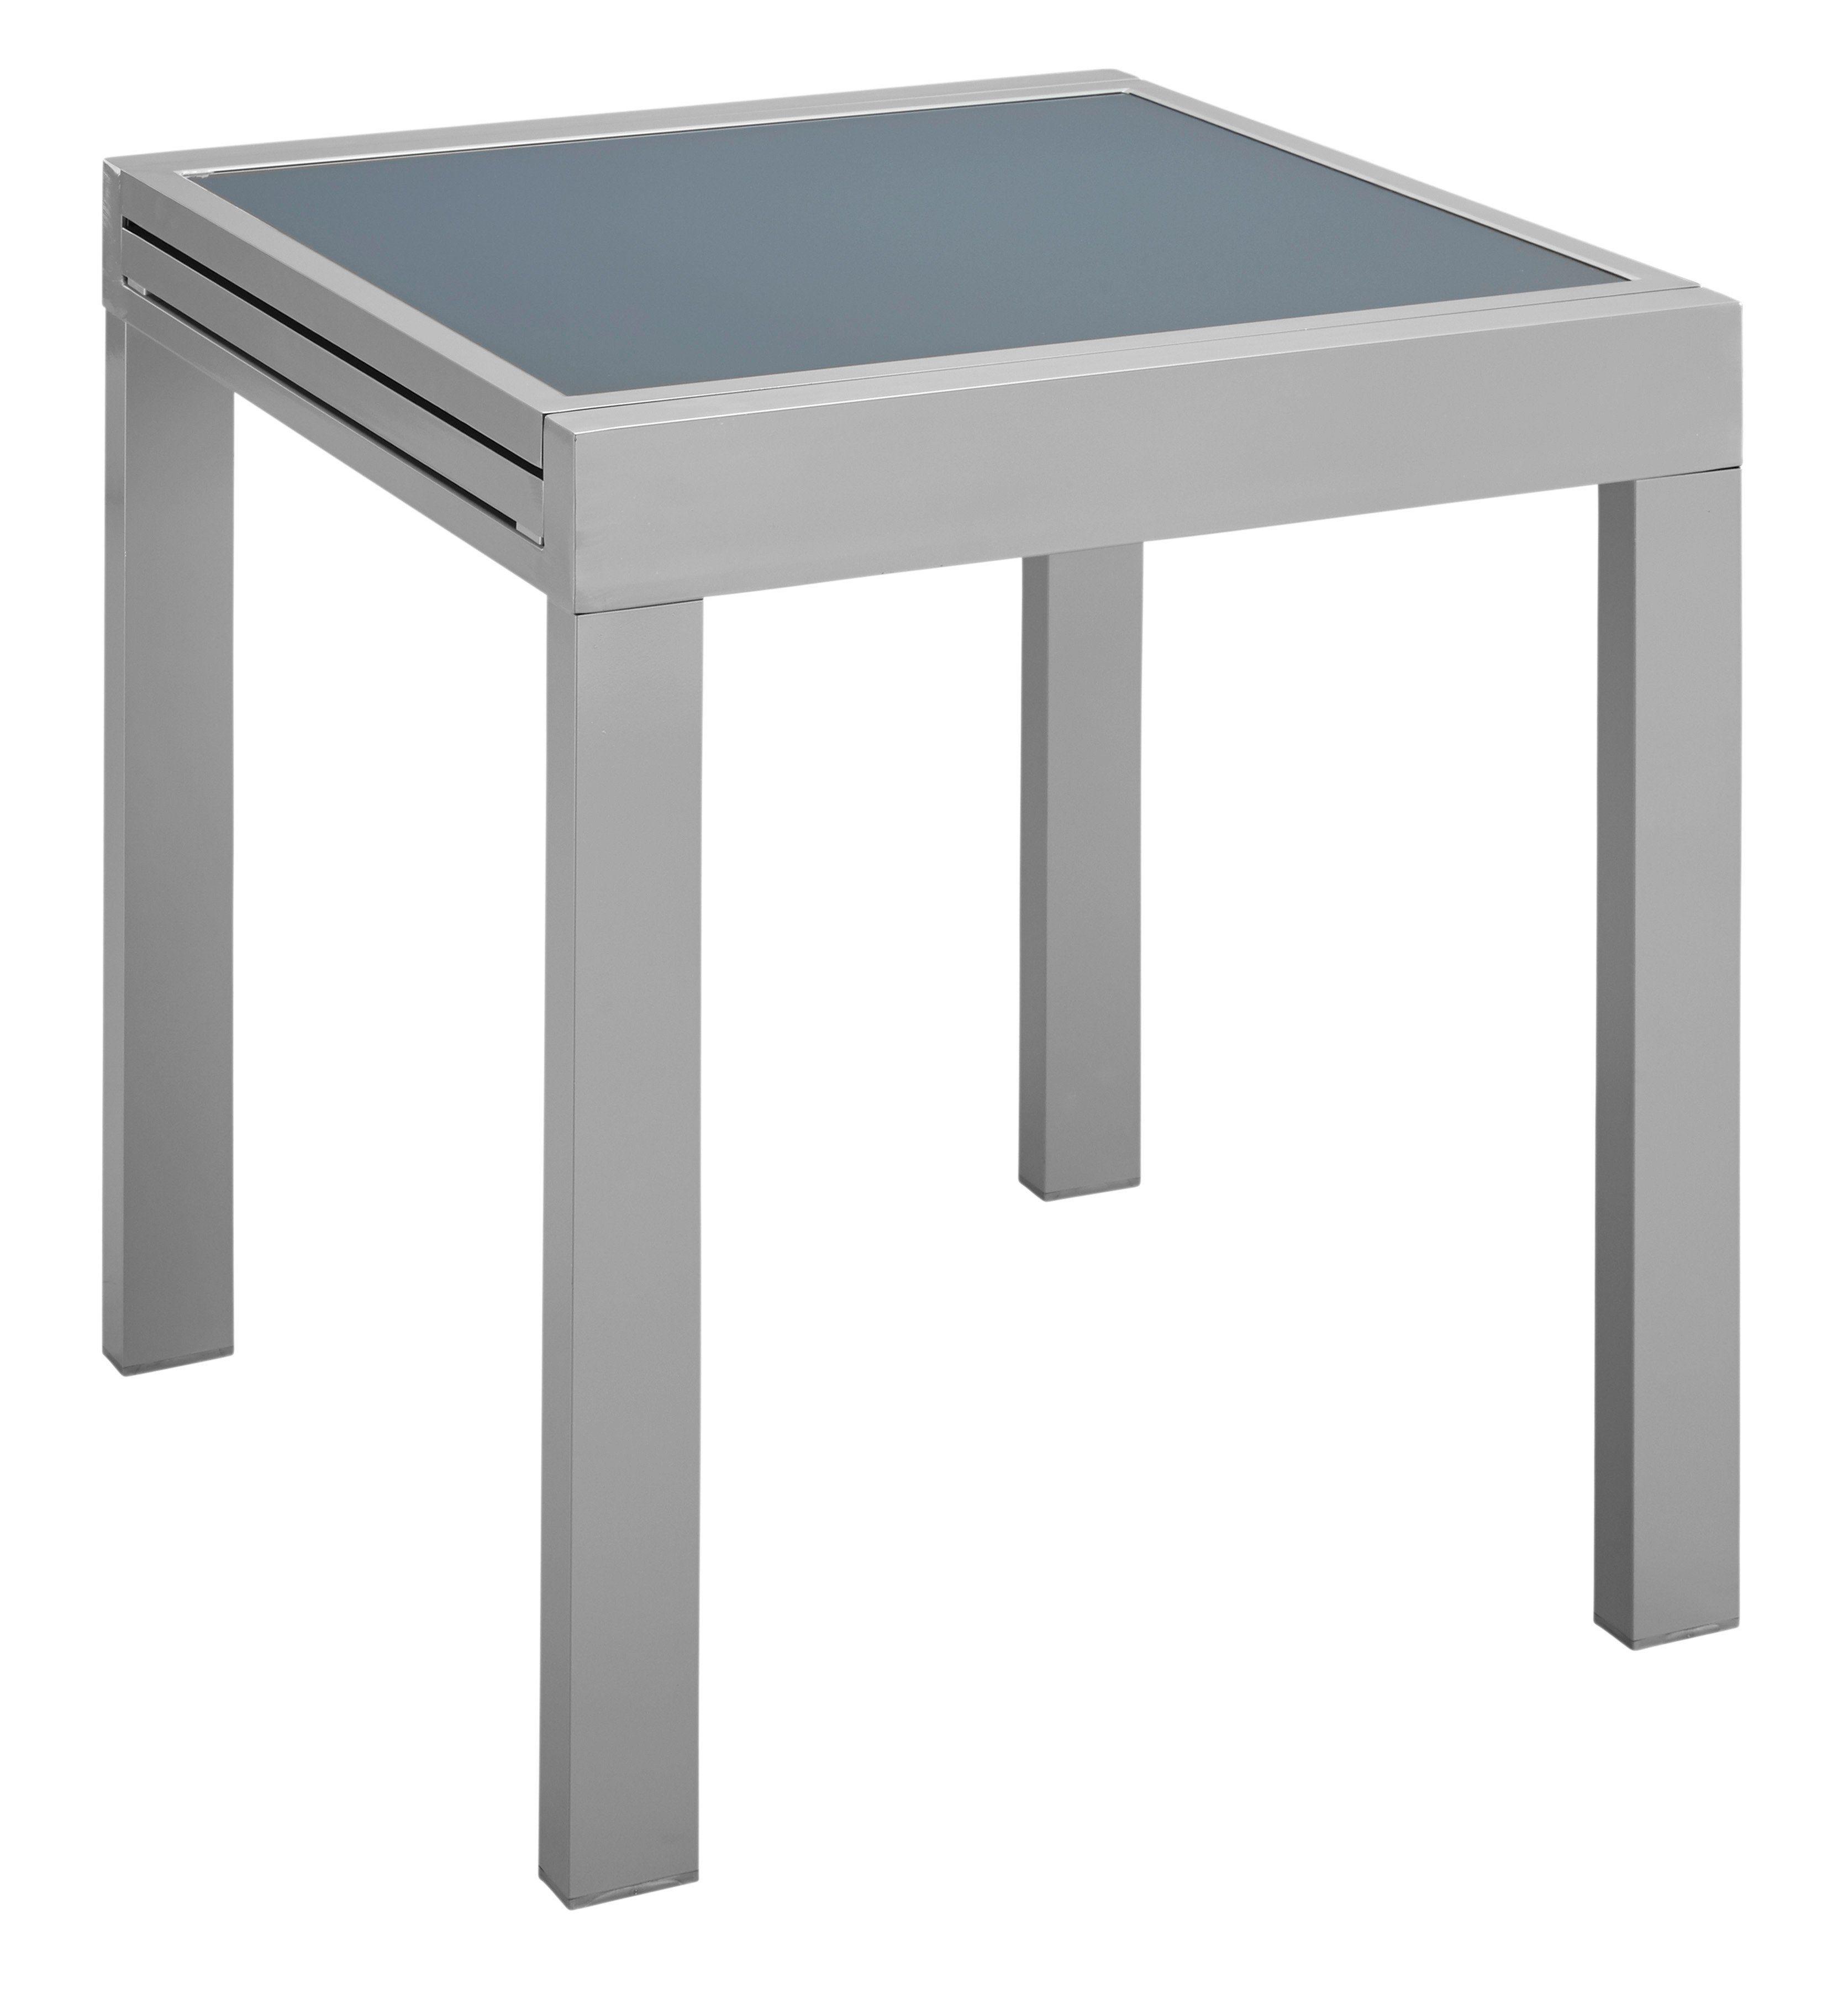 Gartentisch »Lima«, ausziehbar, Aluminium, 65-130x65 cm